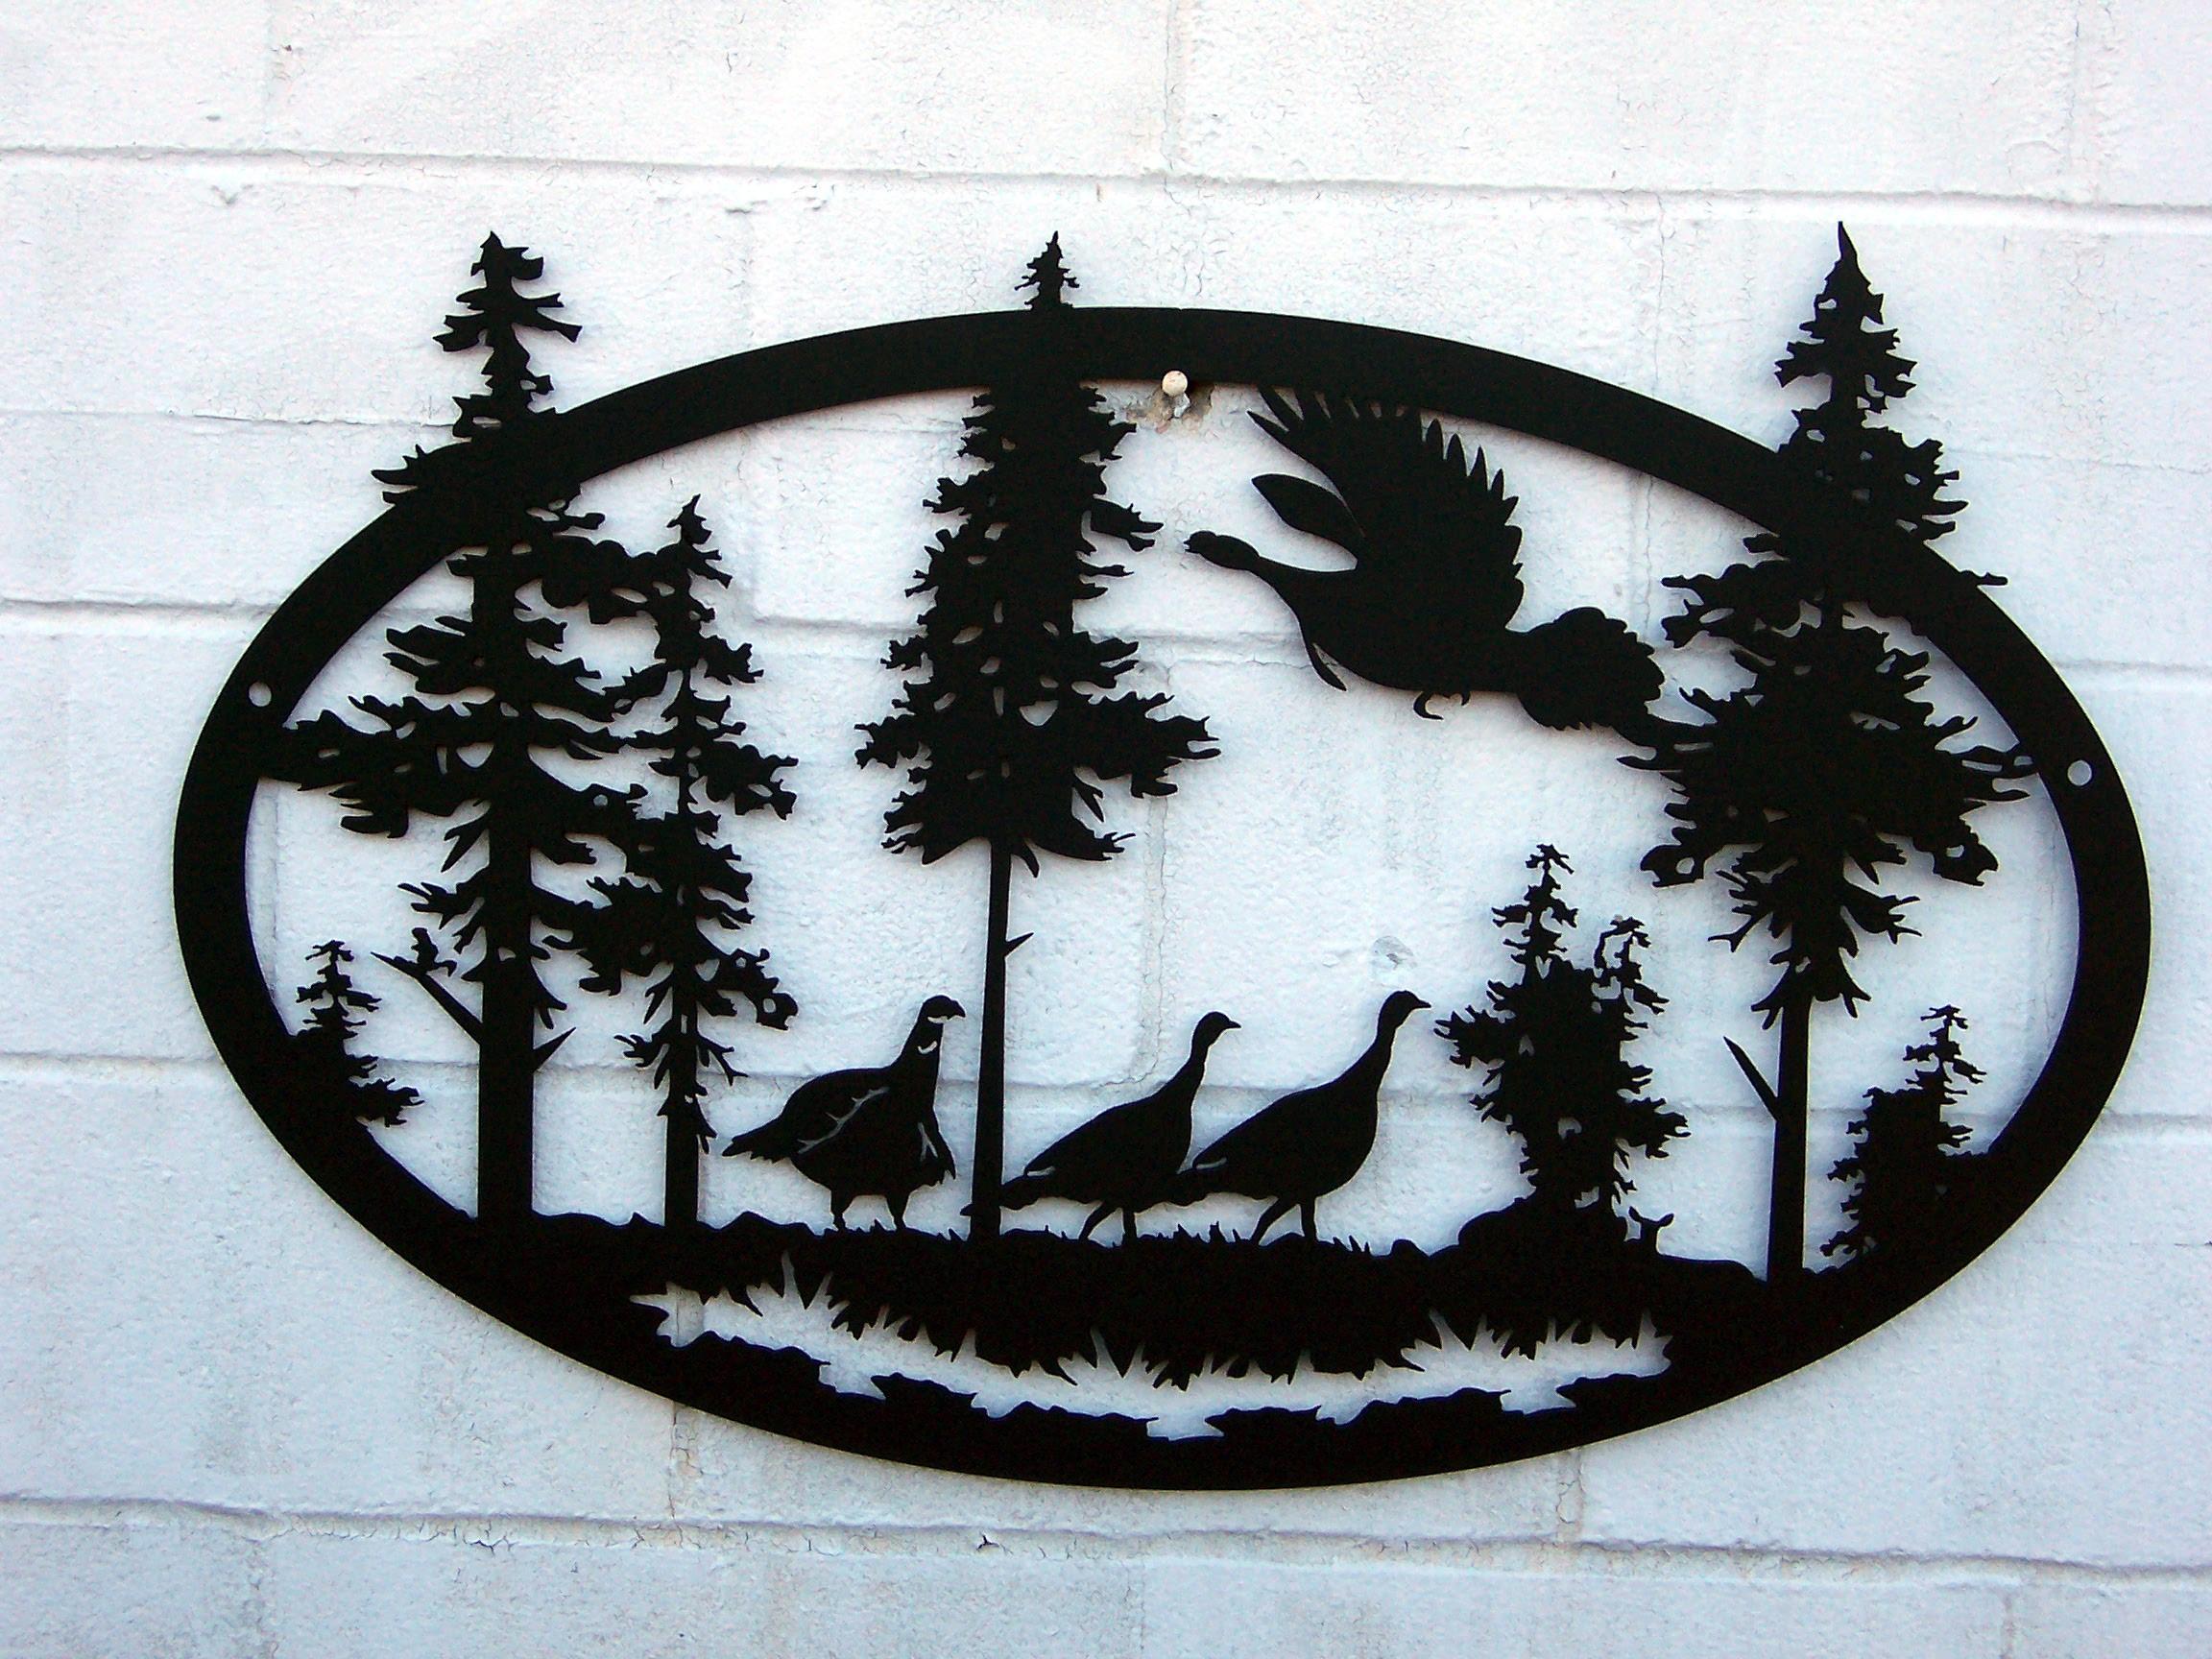 ... .info plasma designs, metal wall art, metal signs, Metal silhouettes